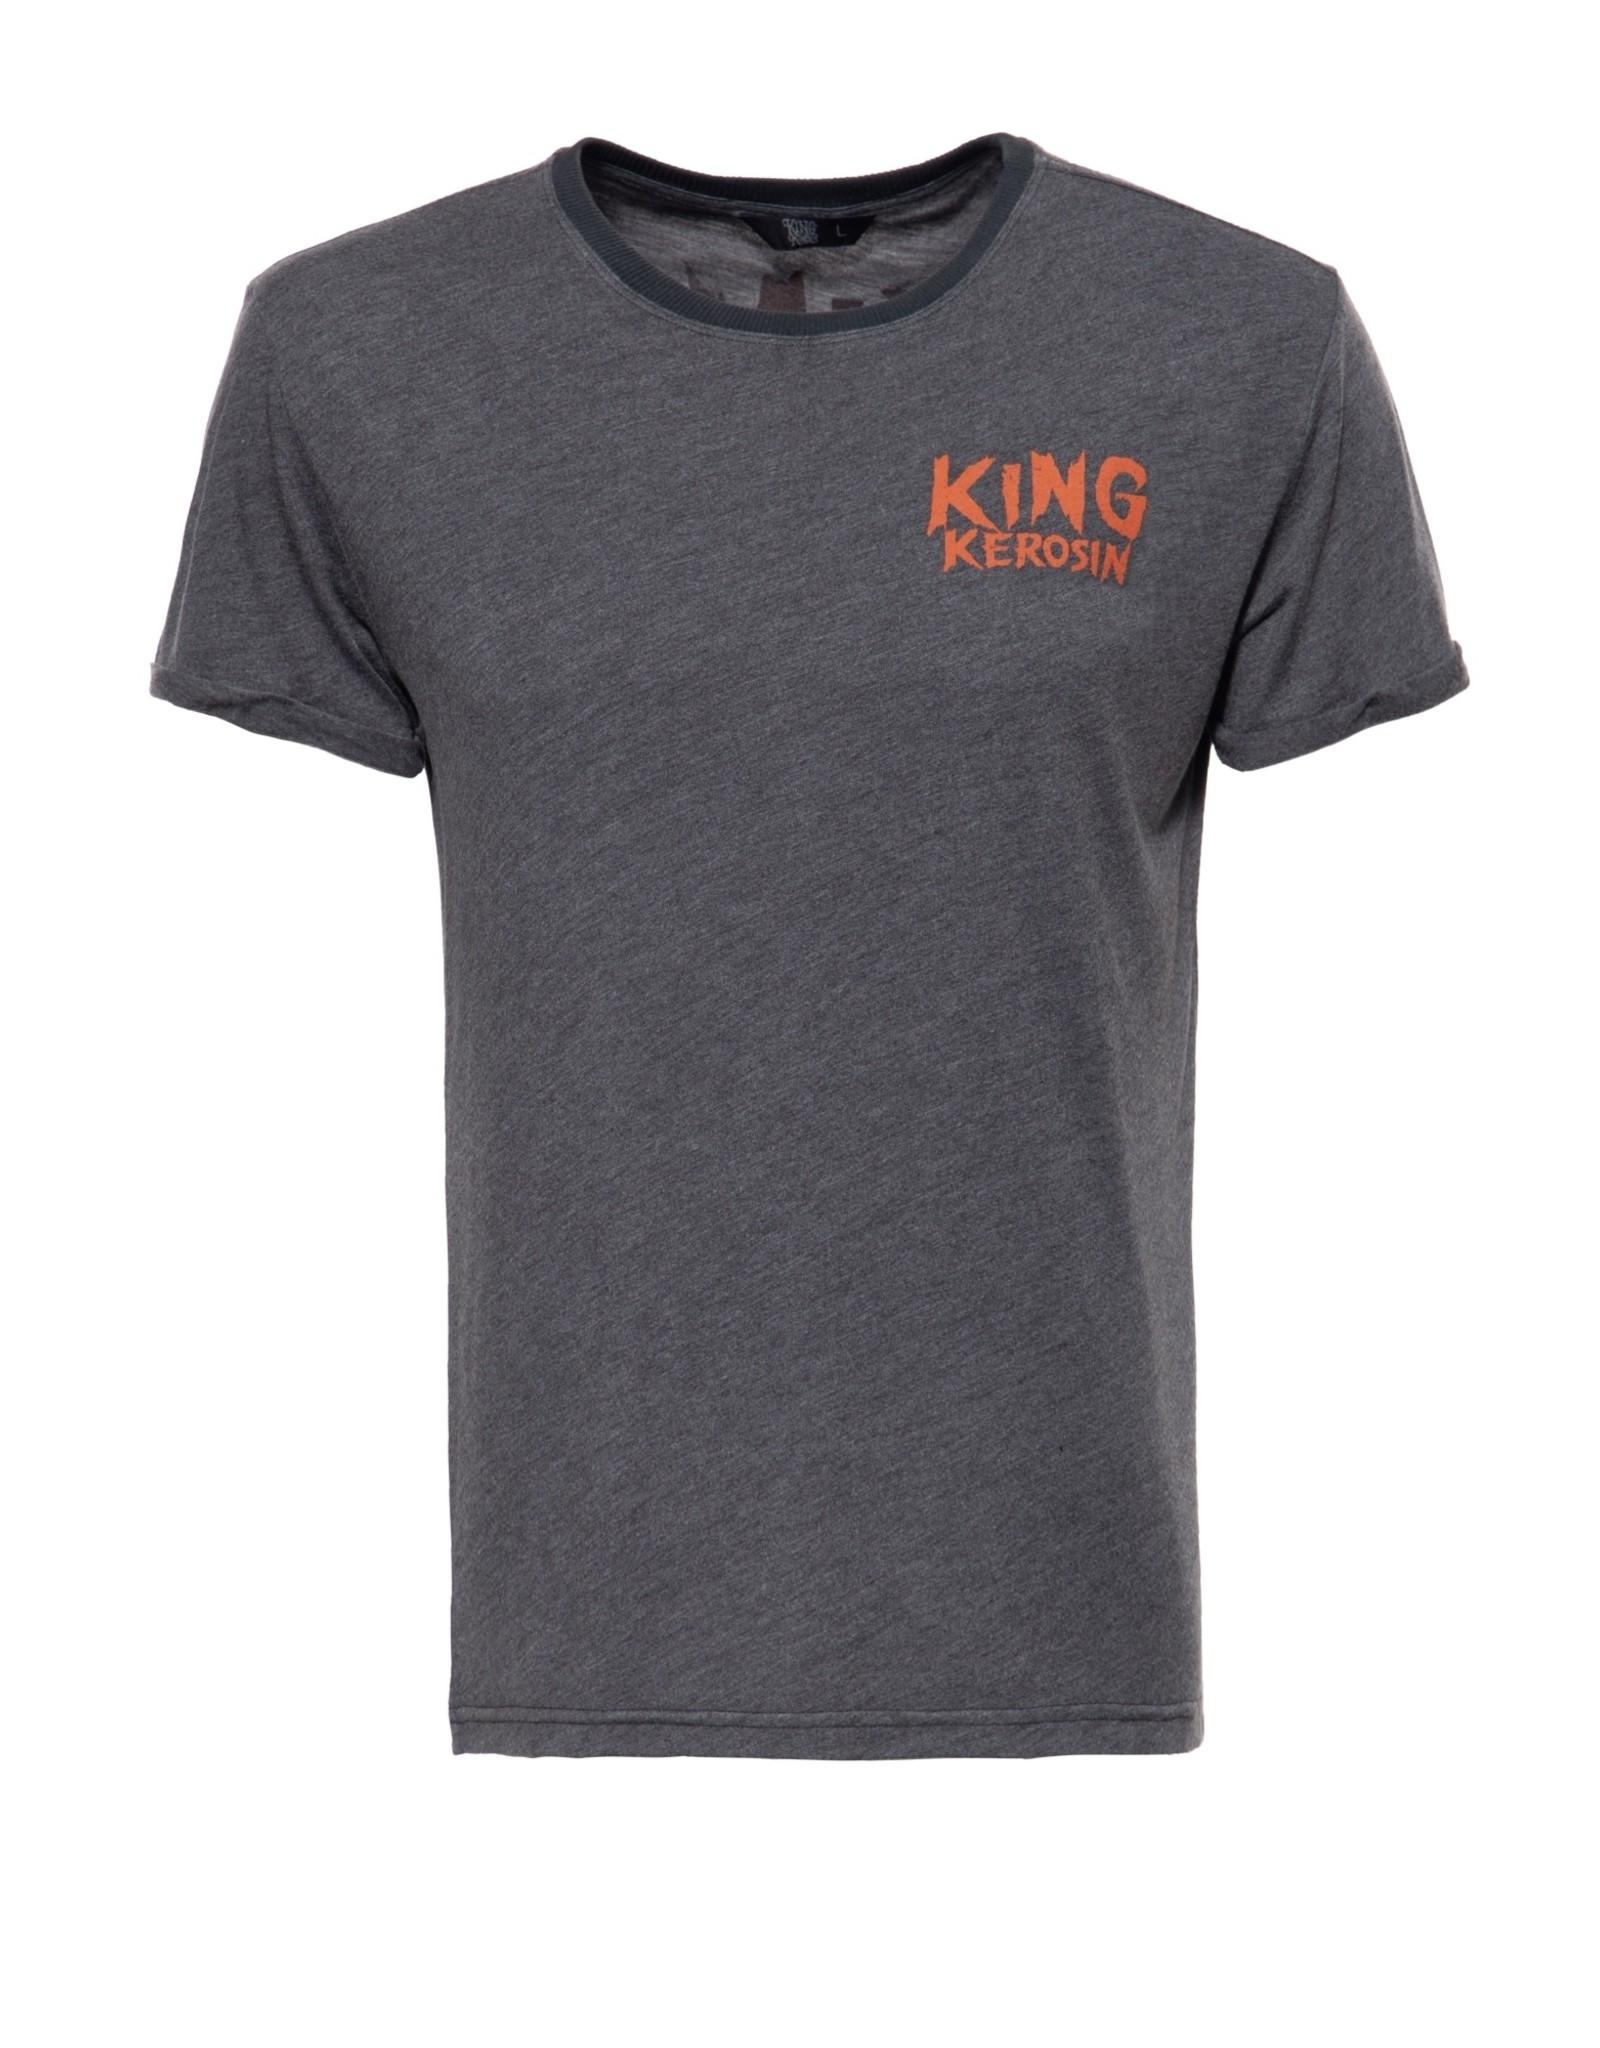 King Kerosin King Kerosin T-Shirt King Of Fucking Everything in Black/Grey